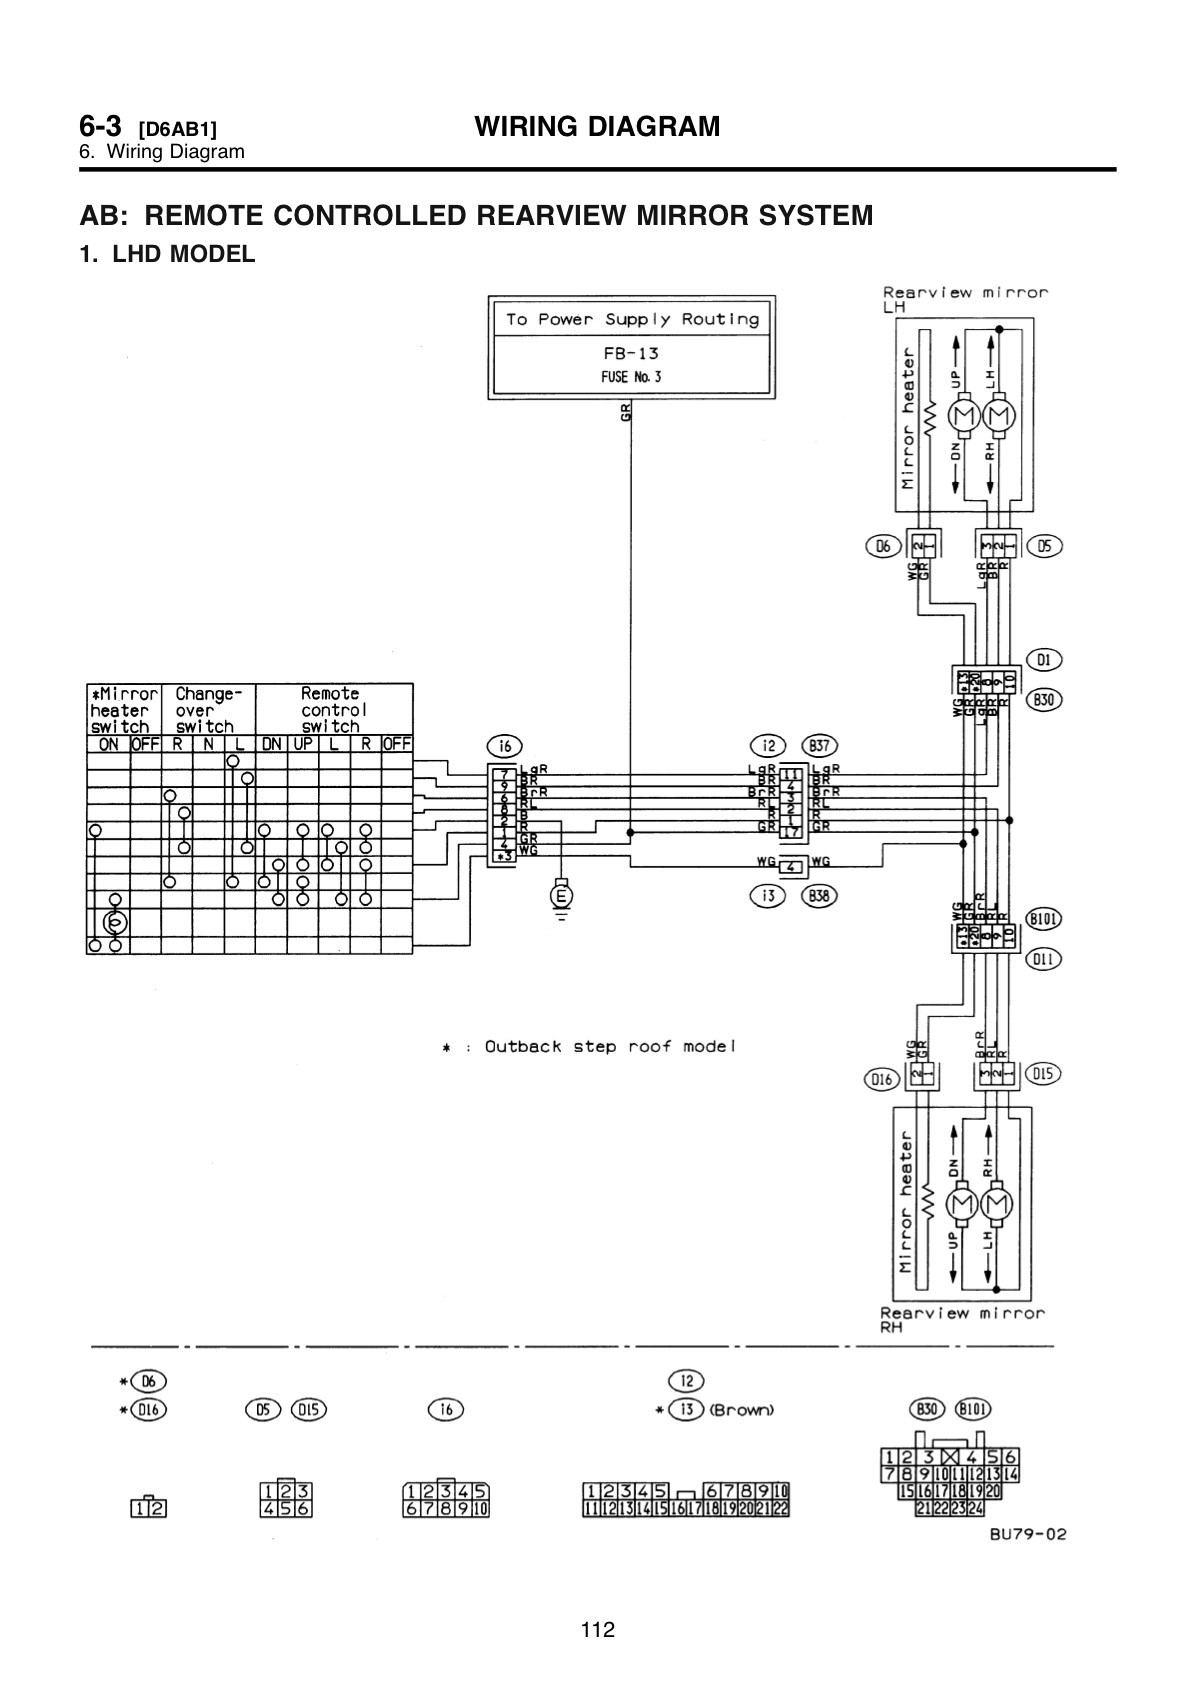 Gentex 453 Wiring Diagram from mainetreasurechest.com